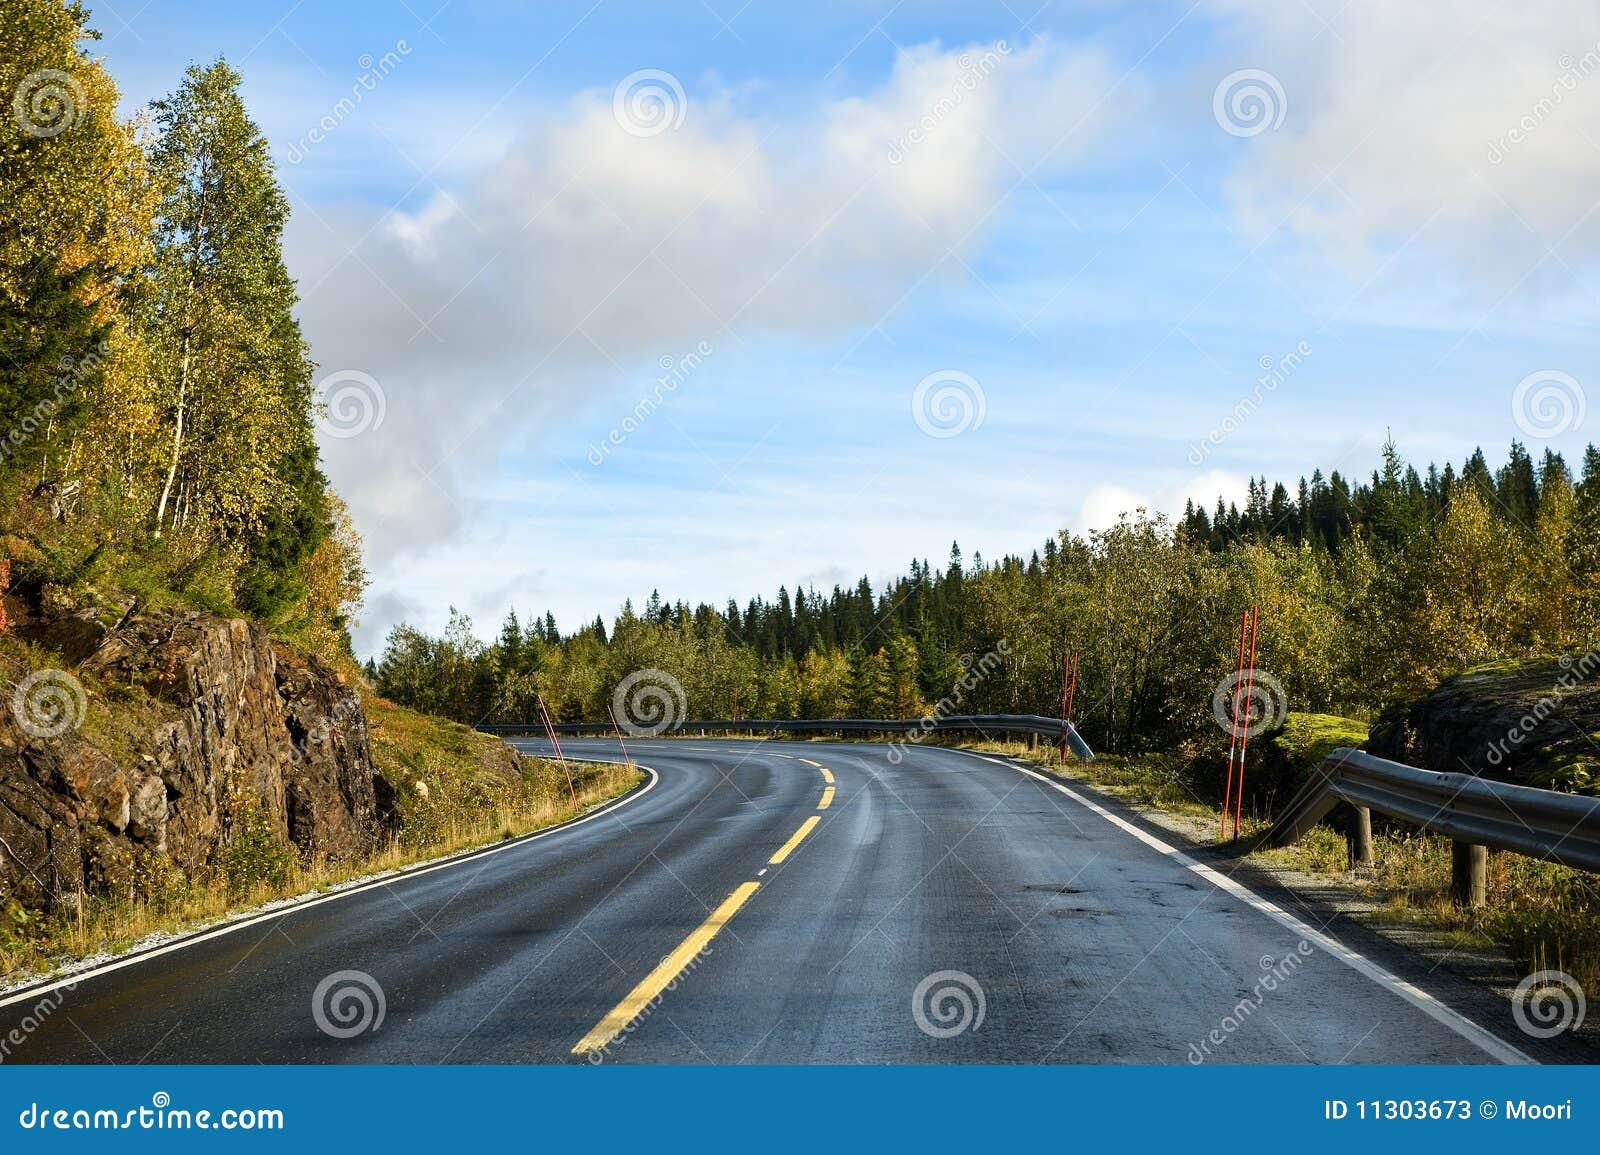 Skandinavische Straße